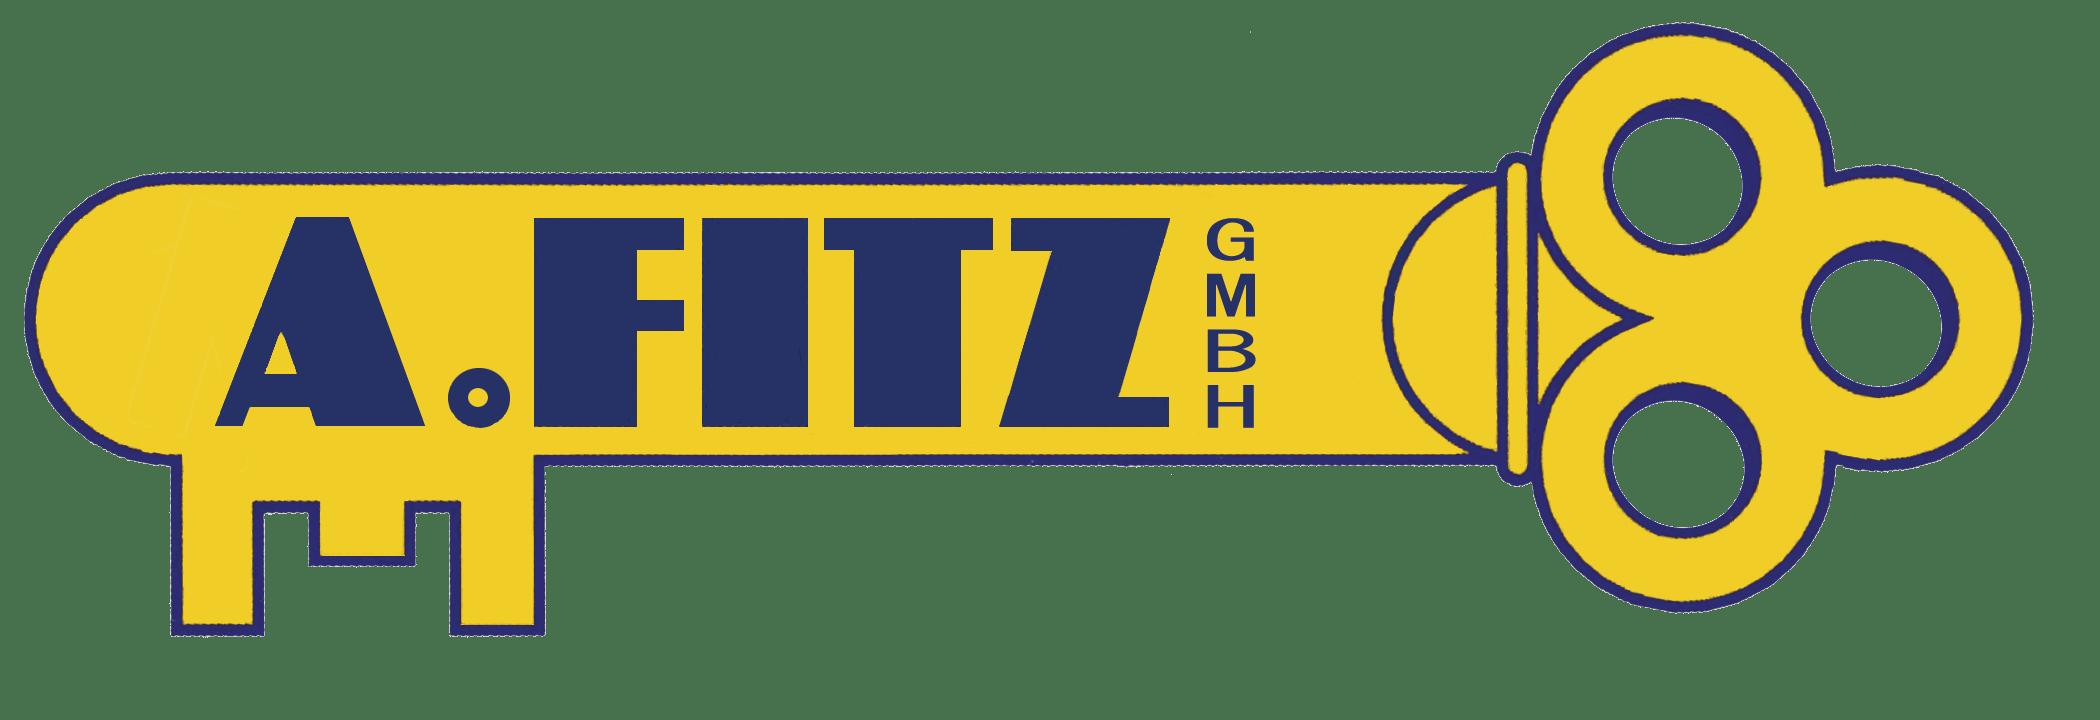 A Fitz GmbH